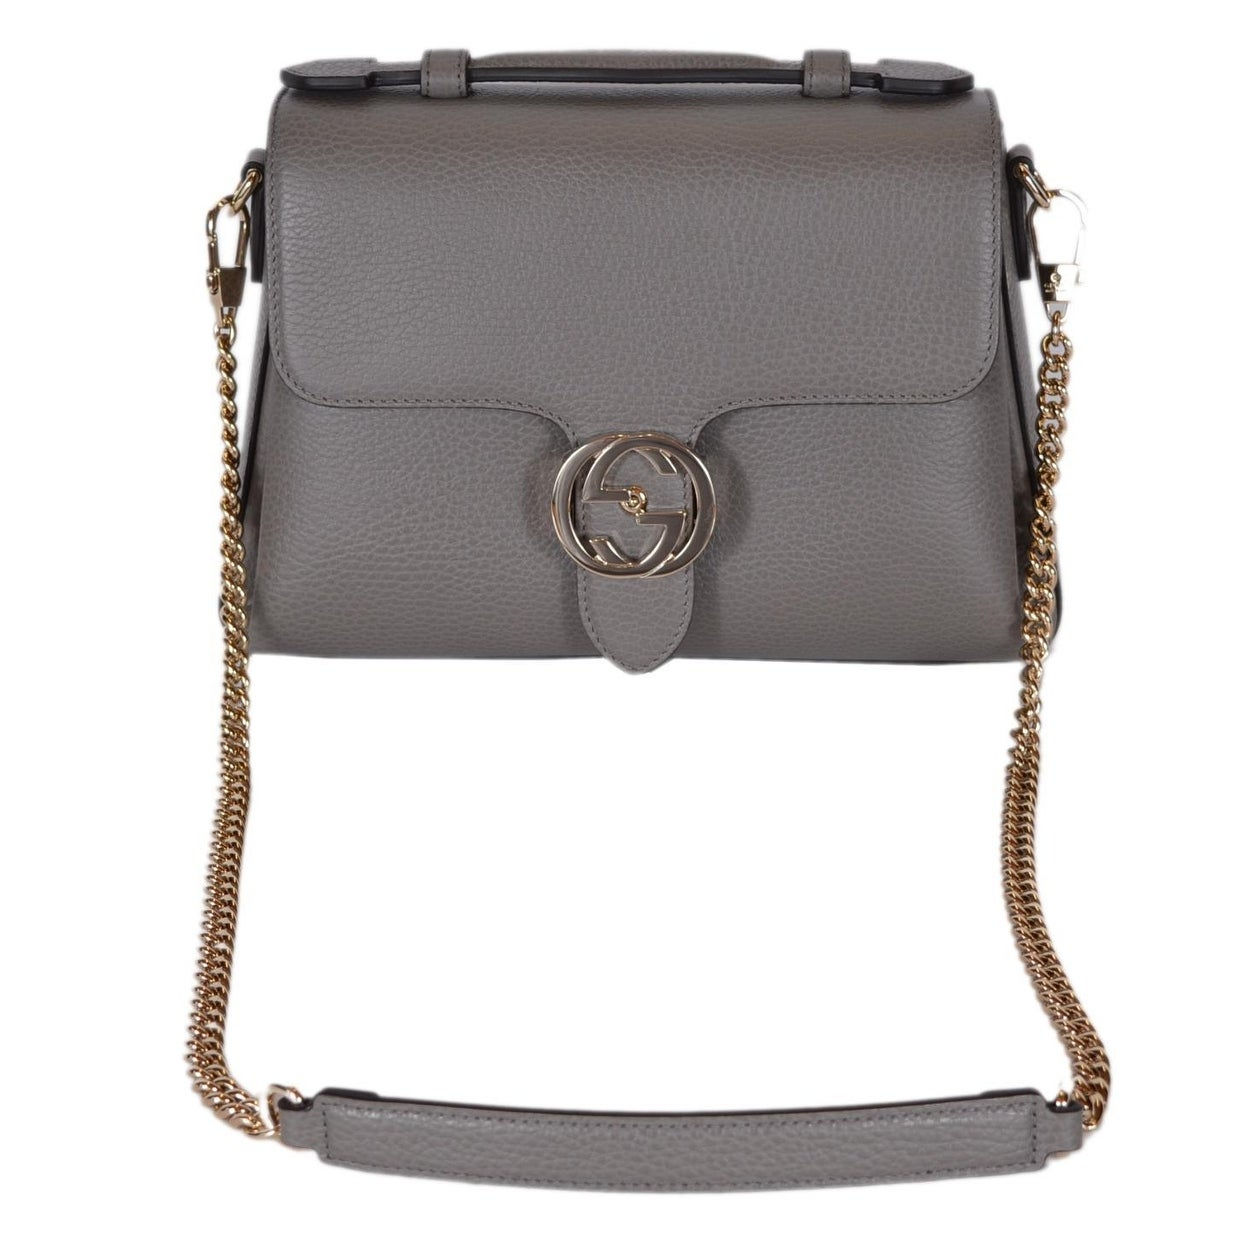 375a4e9ff9 Shop Gucci 510302 Grey Leather Interlocking GG Clasp Convertible Purse  Handbag - Free Shipping Today - Overstock - 22085872